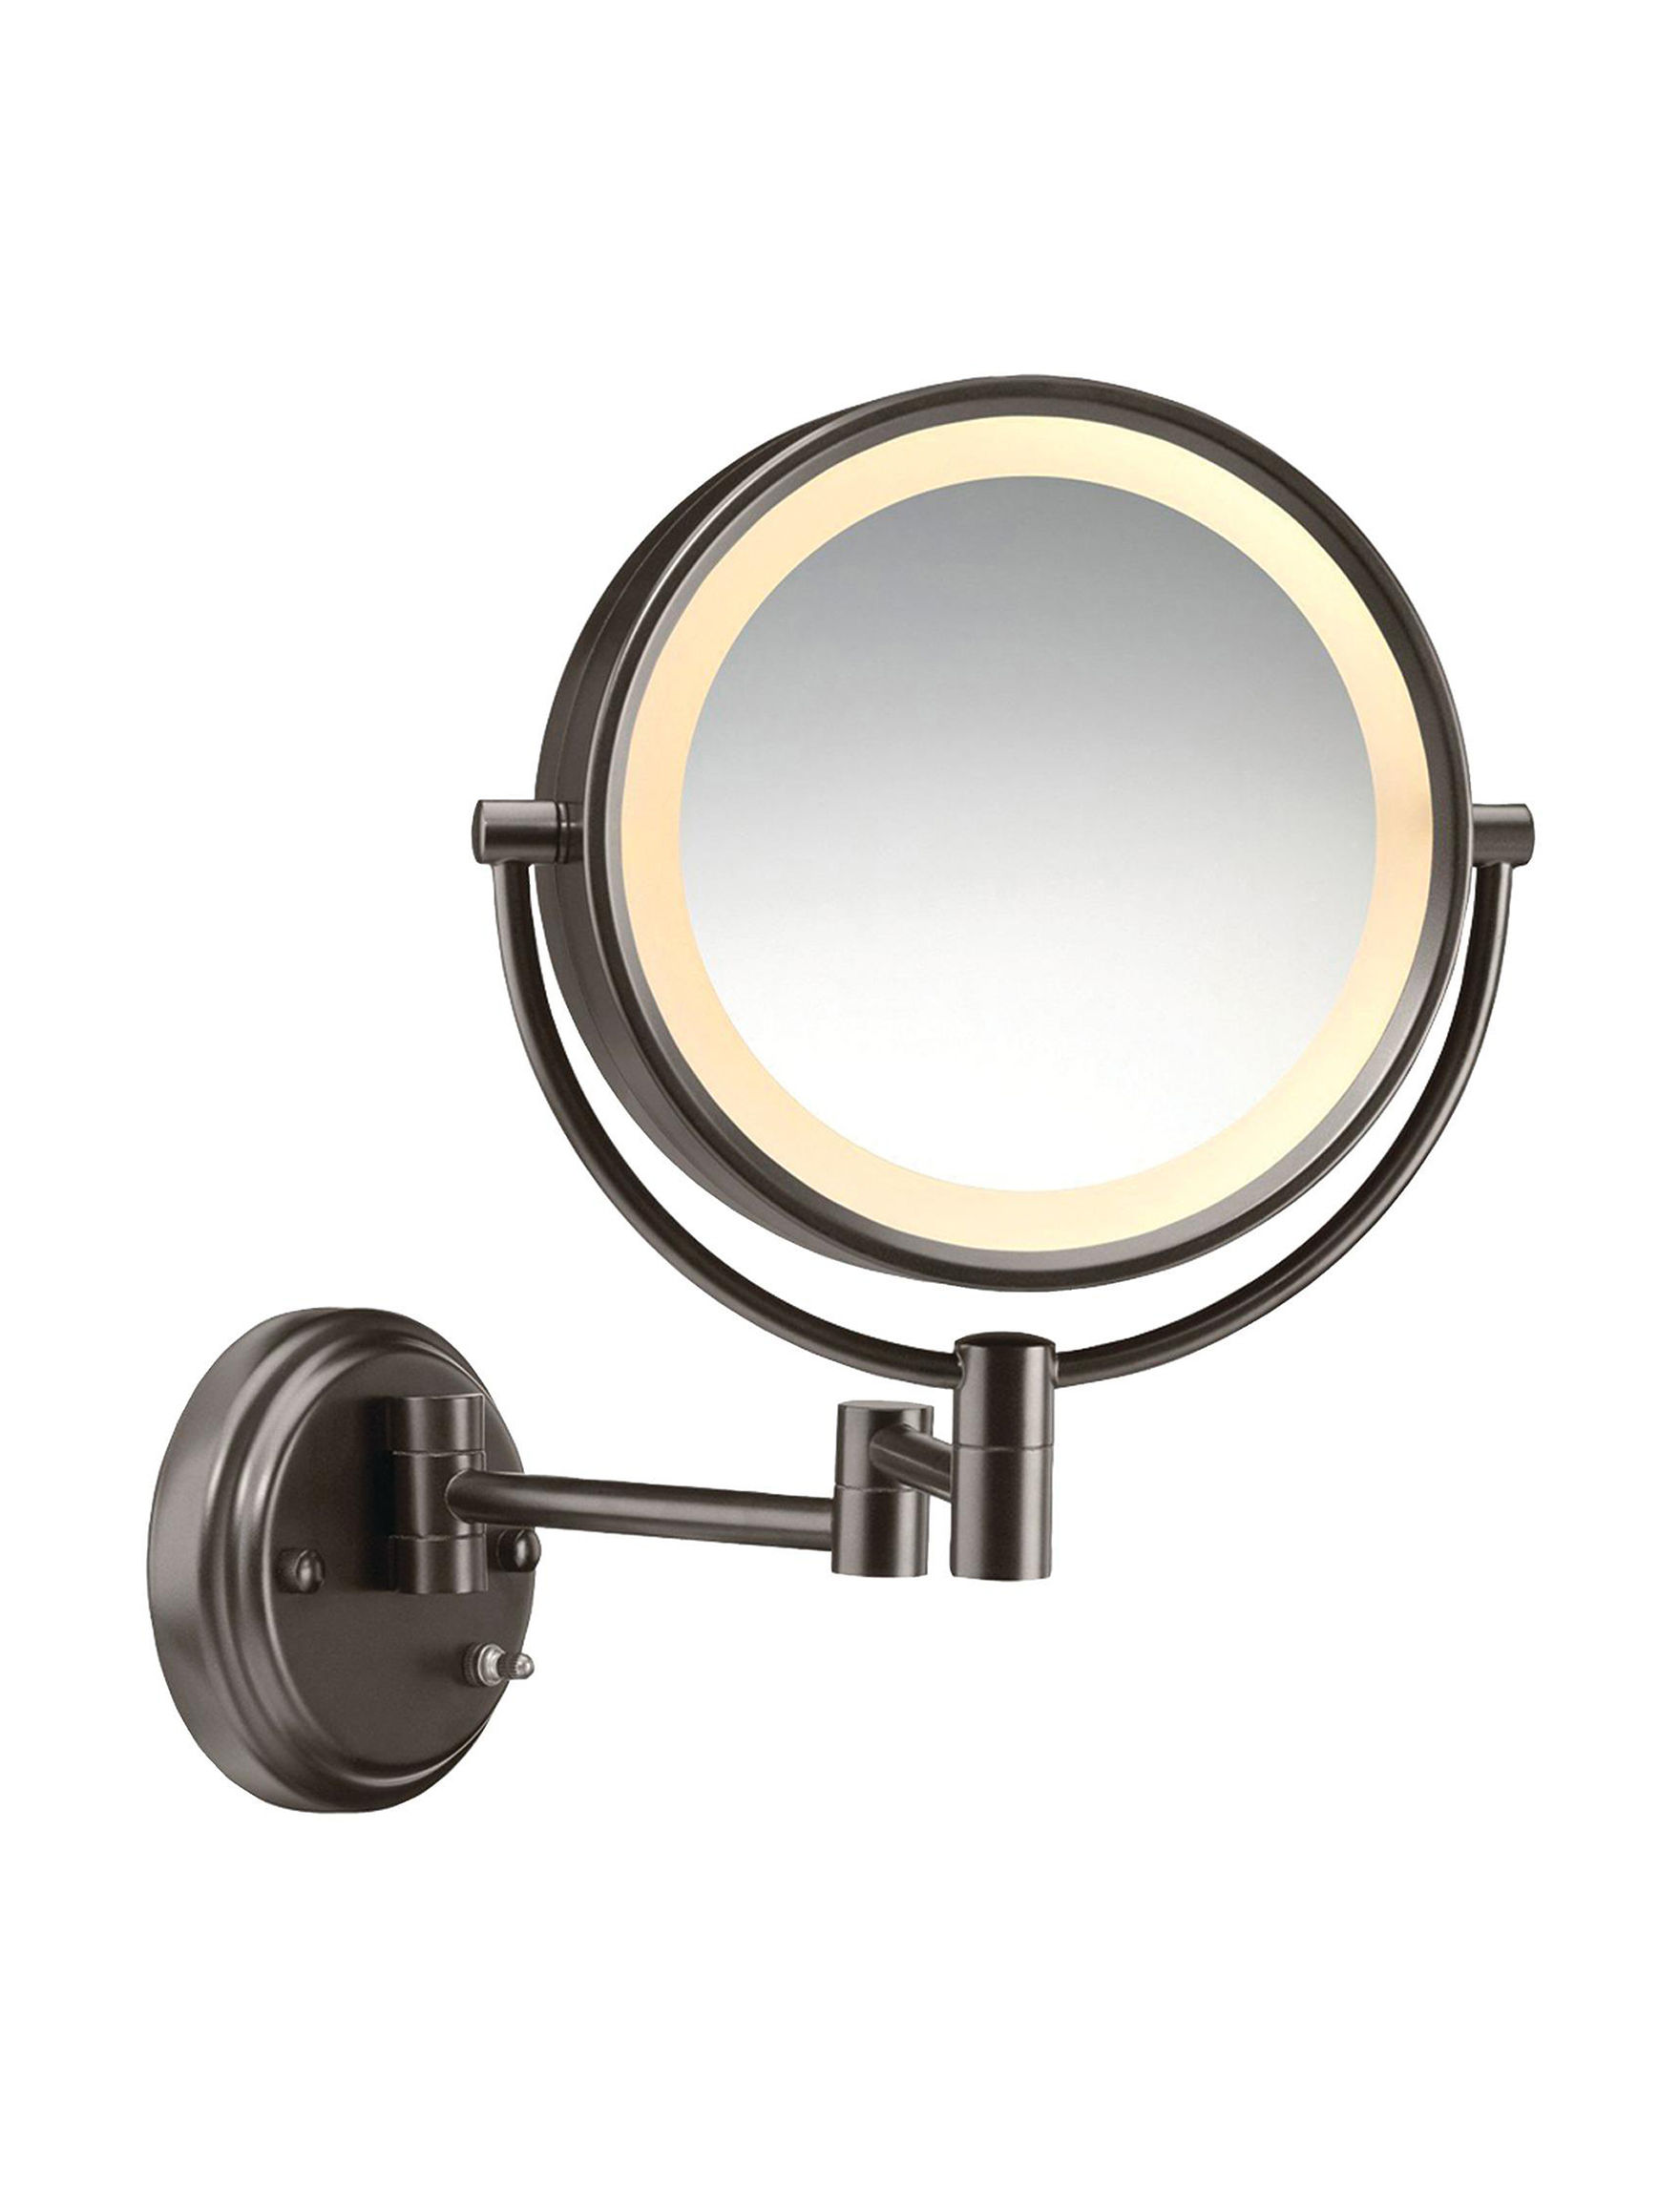 Conair Bronze Vanity Mirrors Bath Accessories